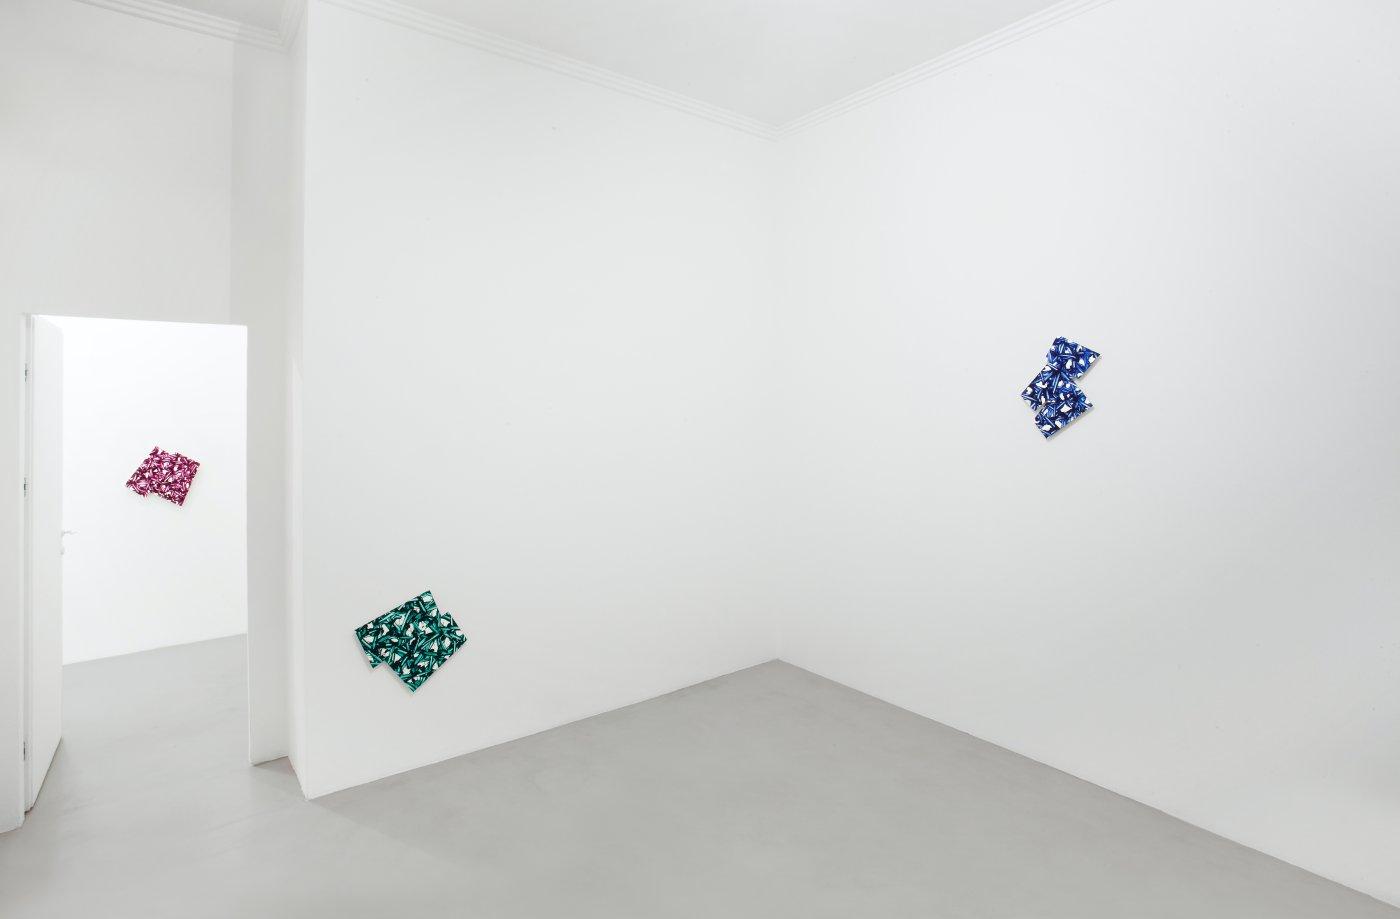 A Arte Invernizzi Gianni Asdrubali 5